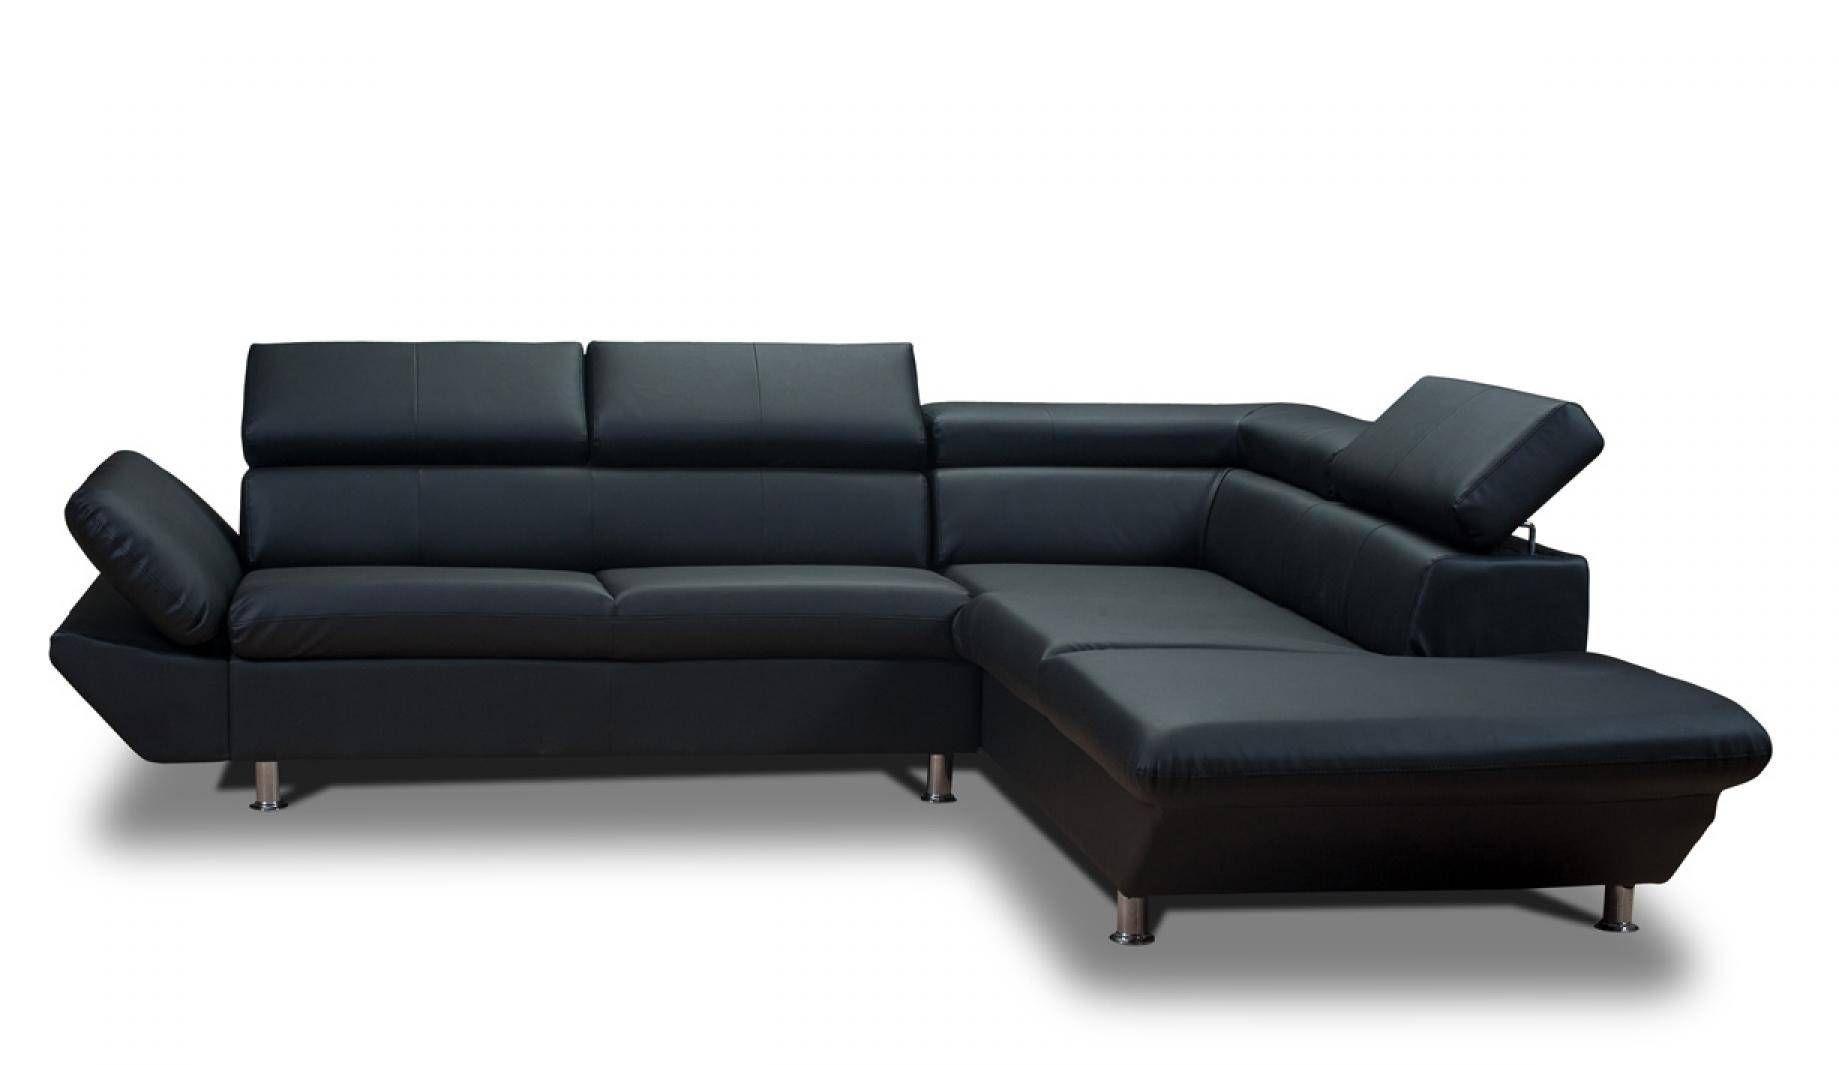 Canappascher Canappasdetissusderrire Canaper Pas Cher Canape Angle Pas Cher But In 2020 Canape Ikea Living Furniture Transforming Furniture